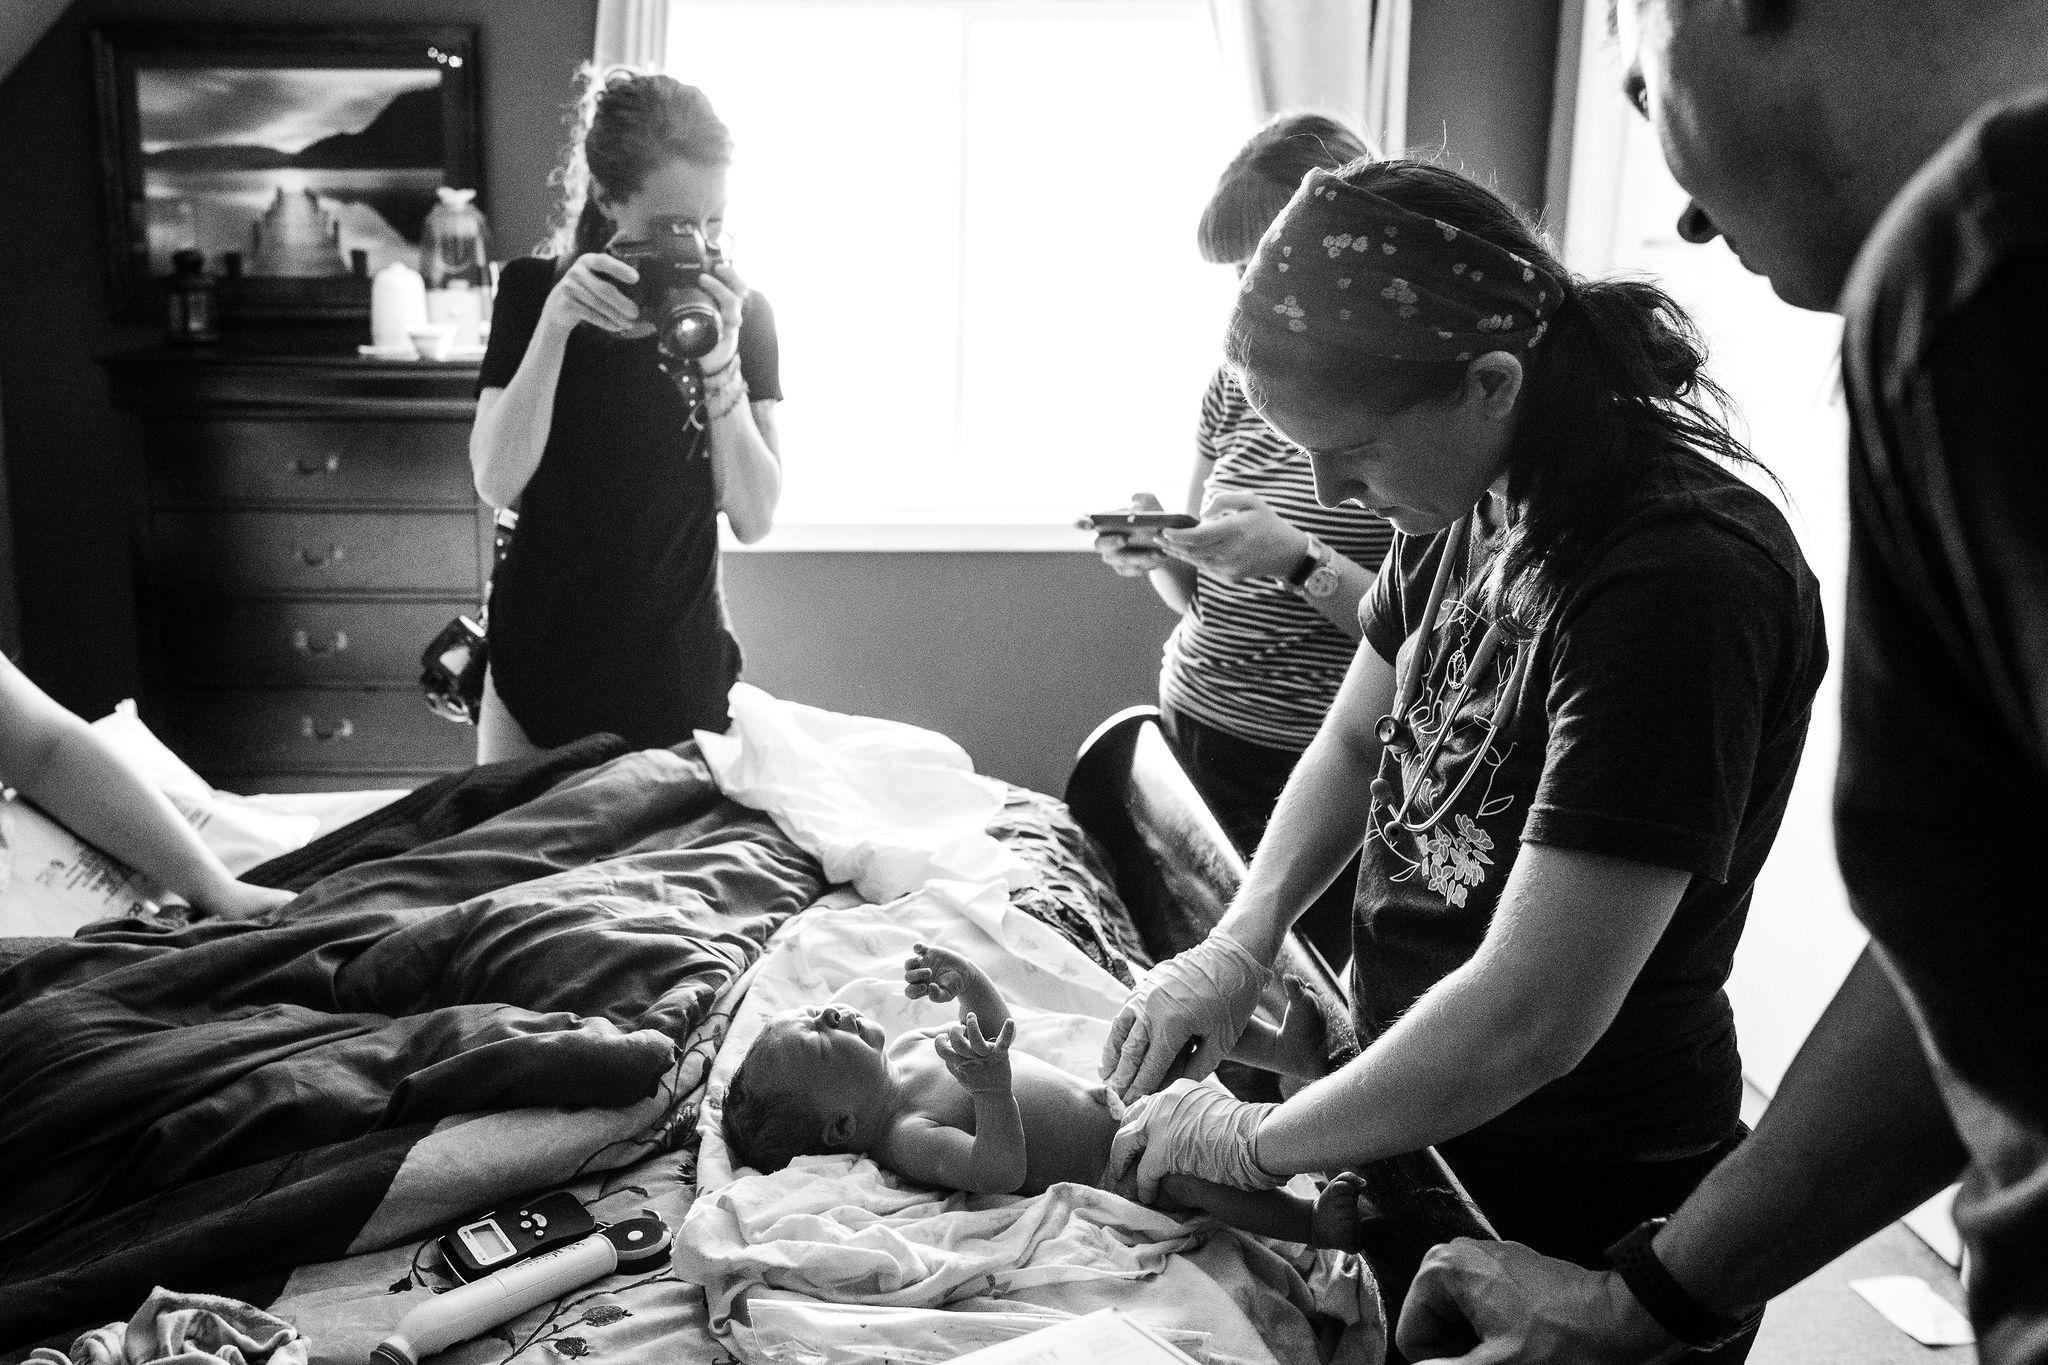 Henslee-Birth-Story-217.jpg